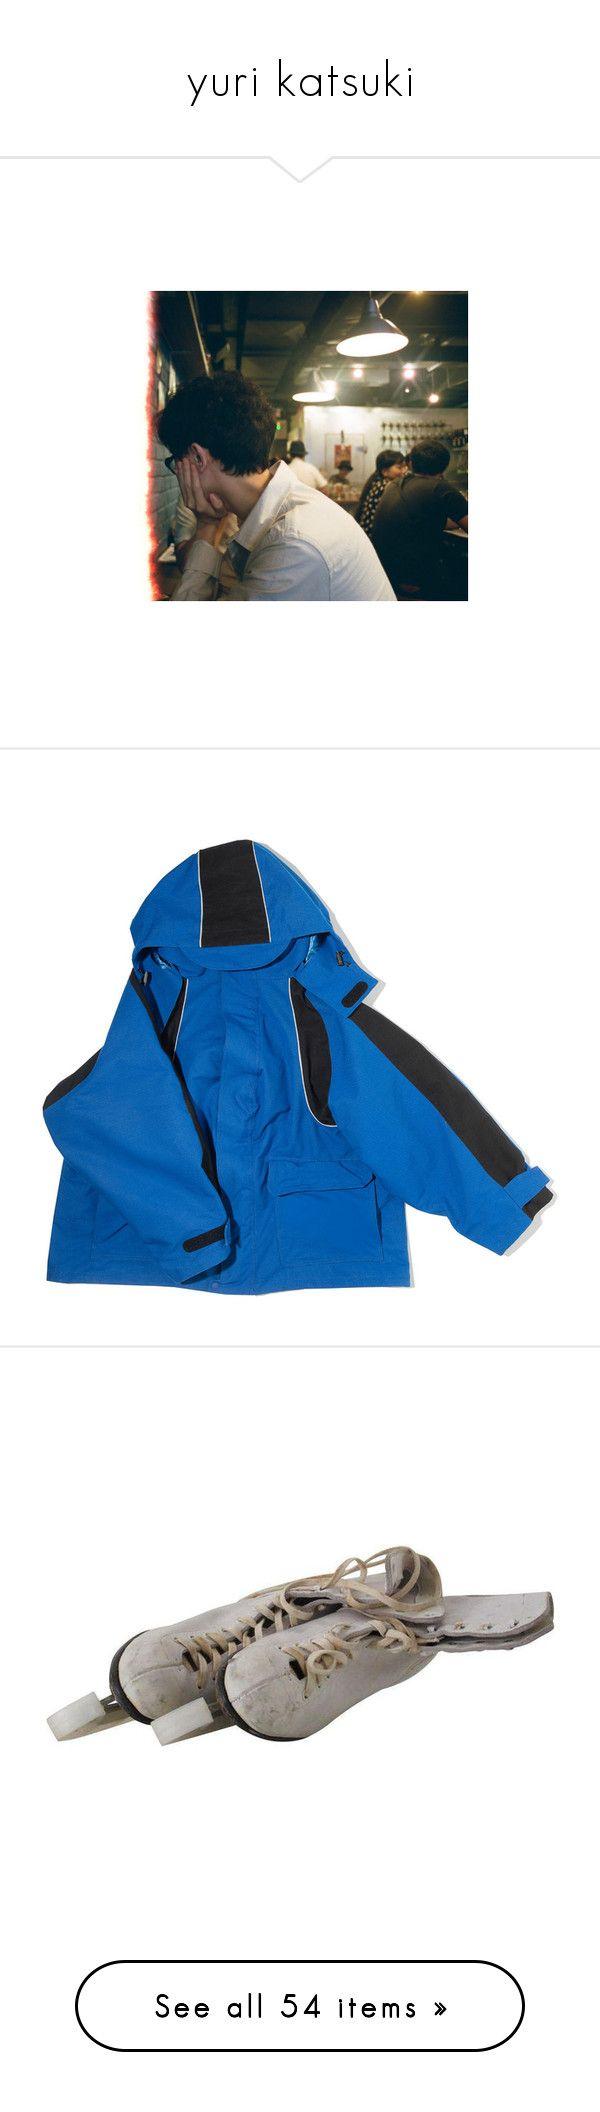 """yuri katsuki"" by citixen ❤ liked on Polyvore featuring backgrounds, people, outerwear, coats, jackets, coats & jackets, tops, blue coat, balenciaga and blue parka"